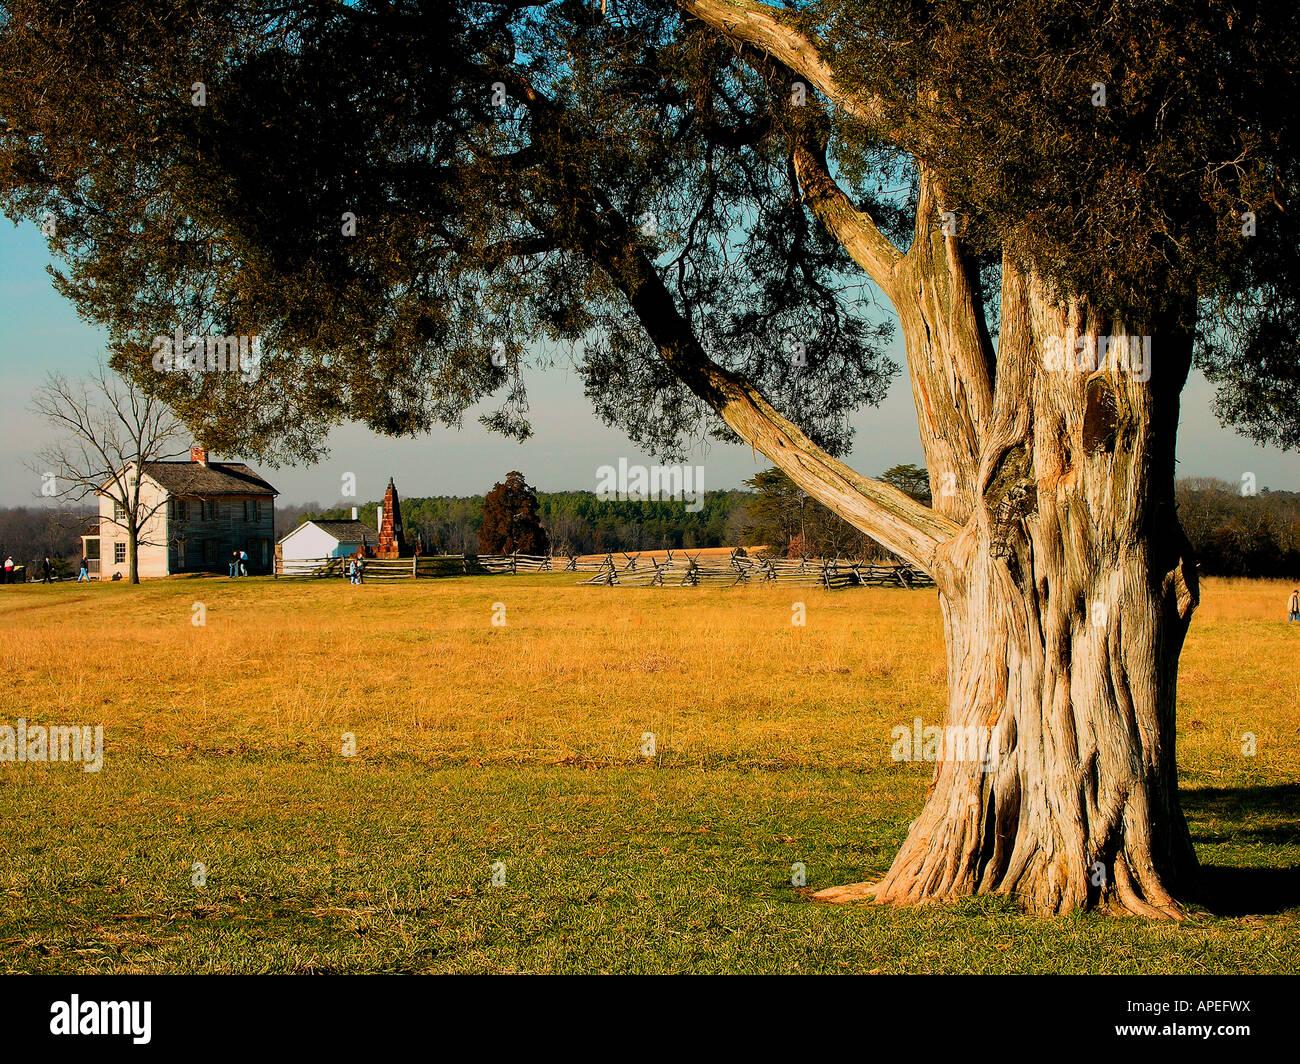 Cedar tree and Henry house, Manassas National Battlefield Park, Manassas, VA - Stock Image